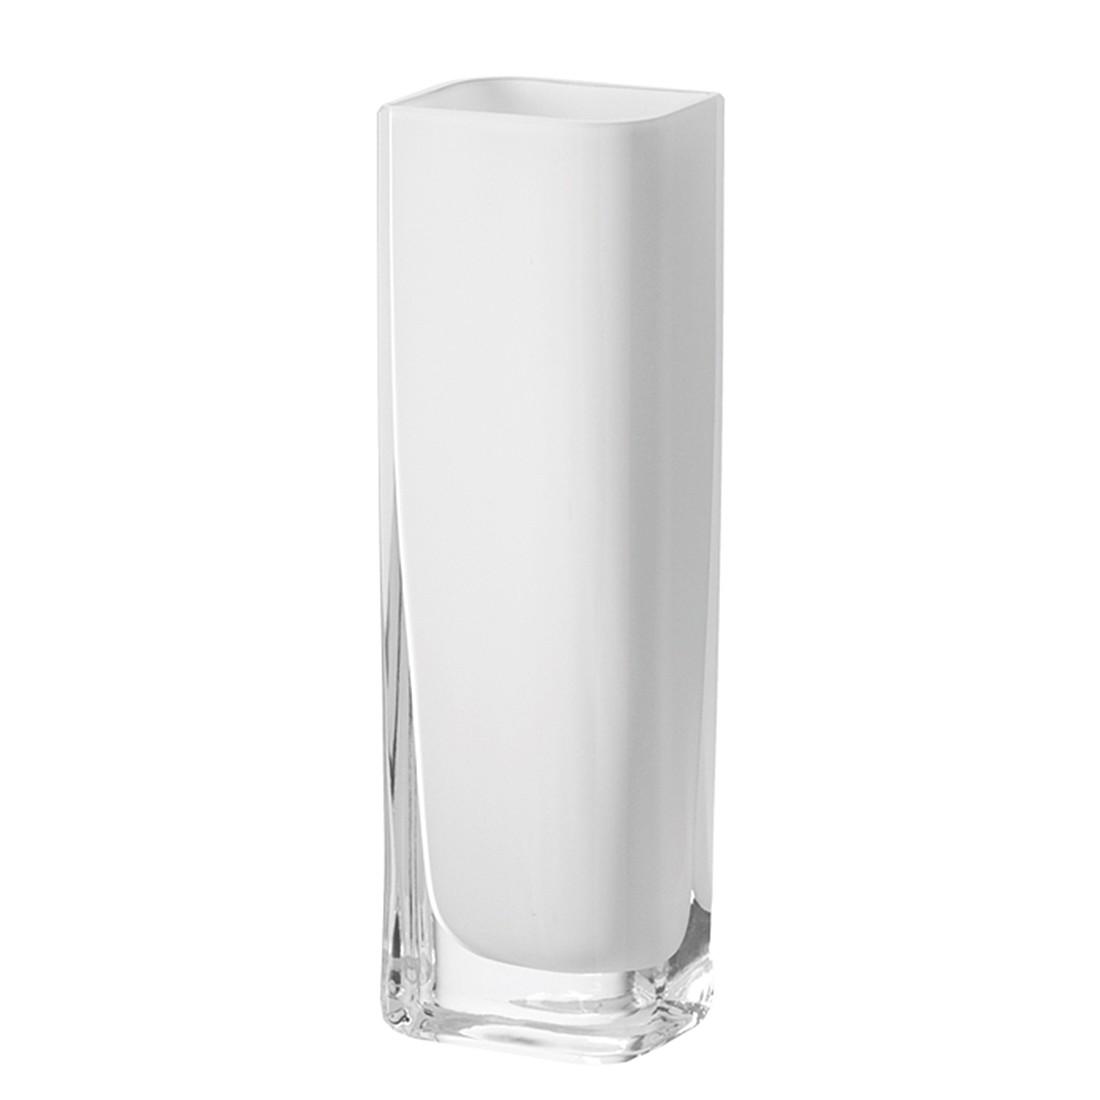 Vase Lucca - Weiß, Leonardo